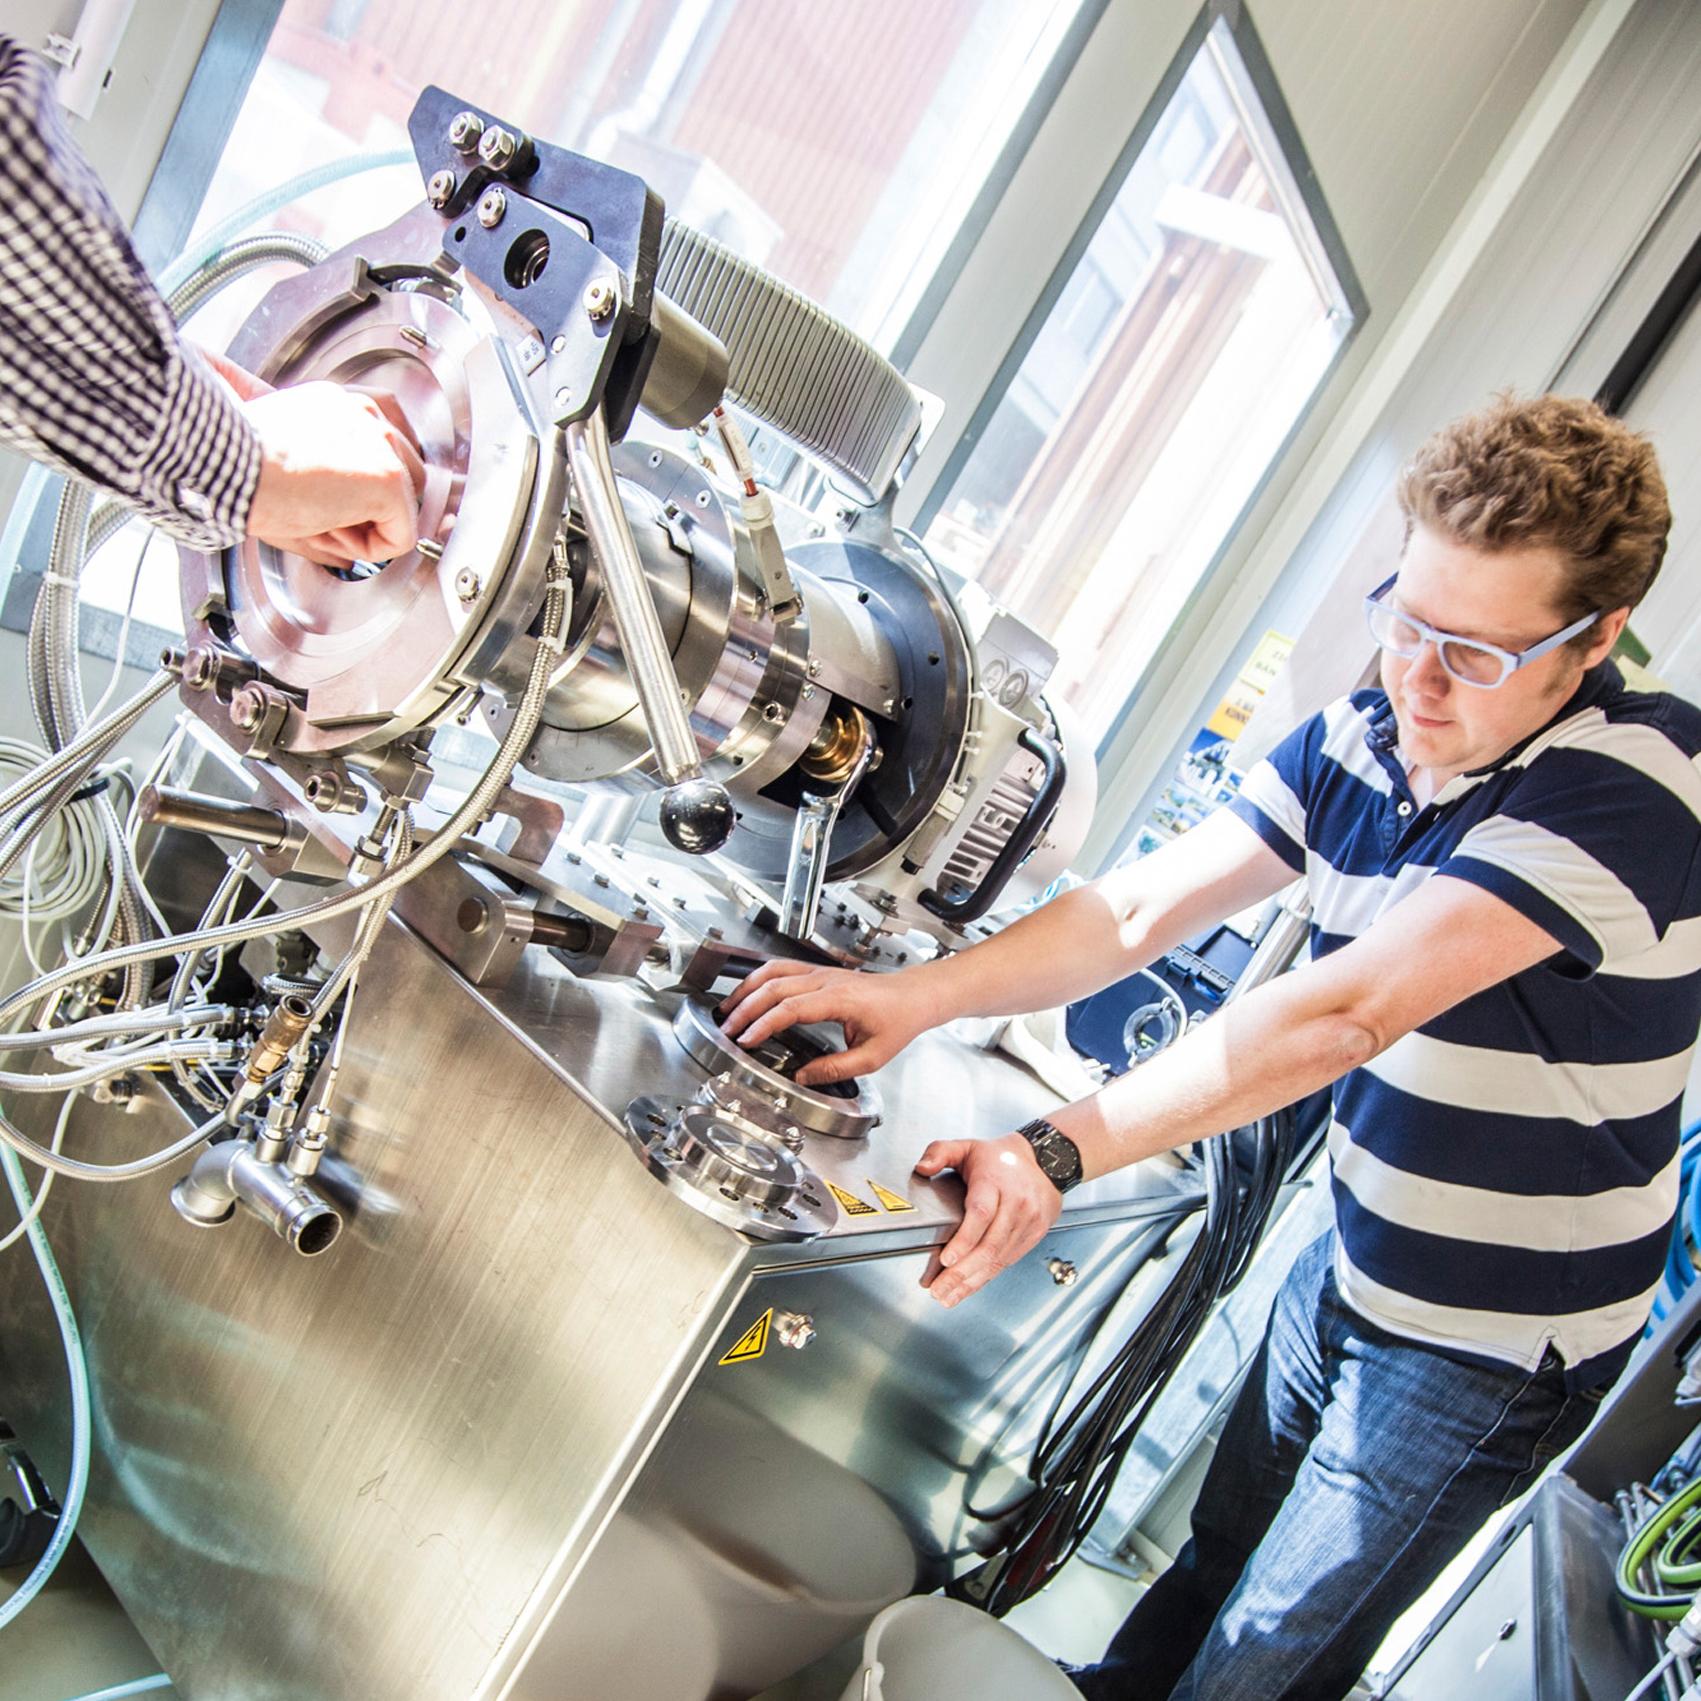 Master's Degree Programme Biomedical Engineering - TU Graz